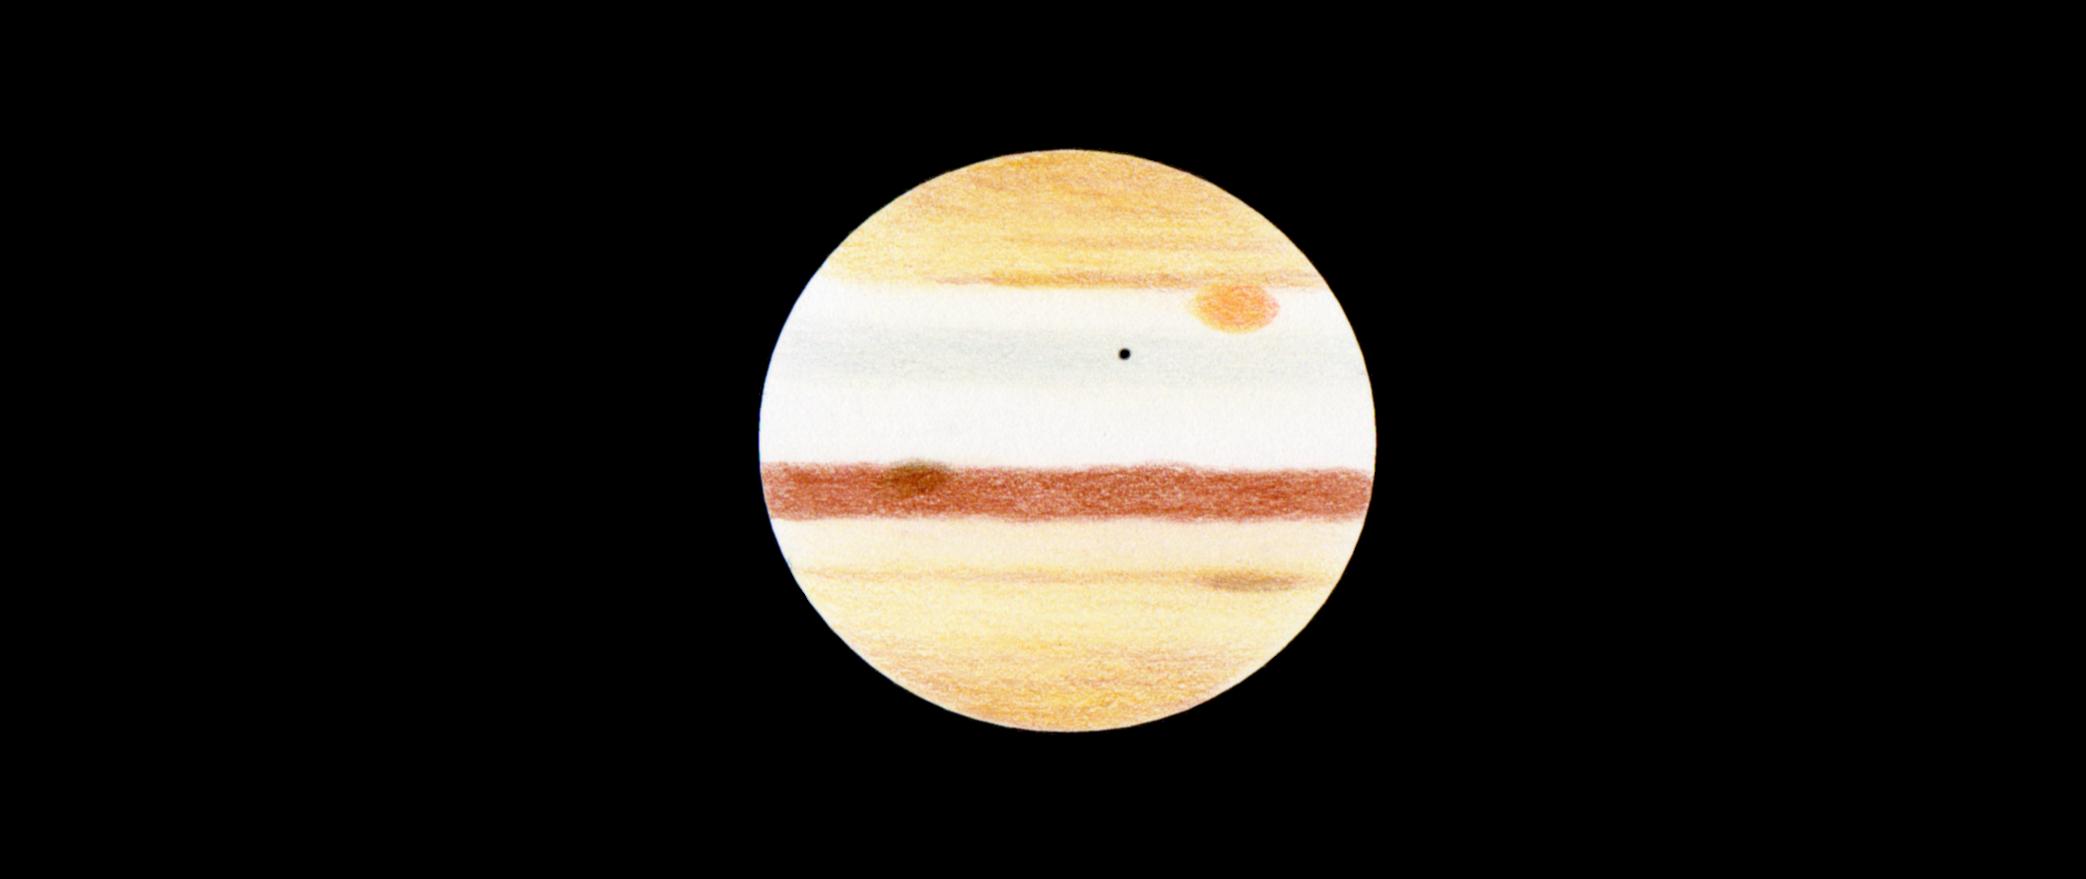 http://ekladata.com/TMr6jcequJf6cT0kXU3OisoHfE0/Jupiter-25-01-2010-T150.png